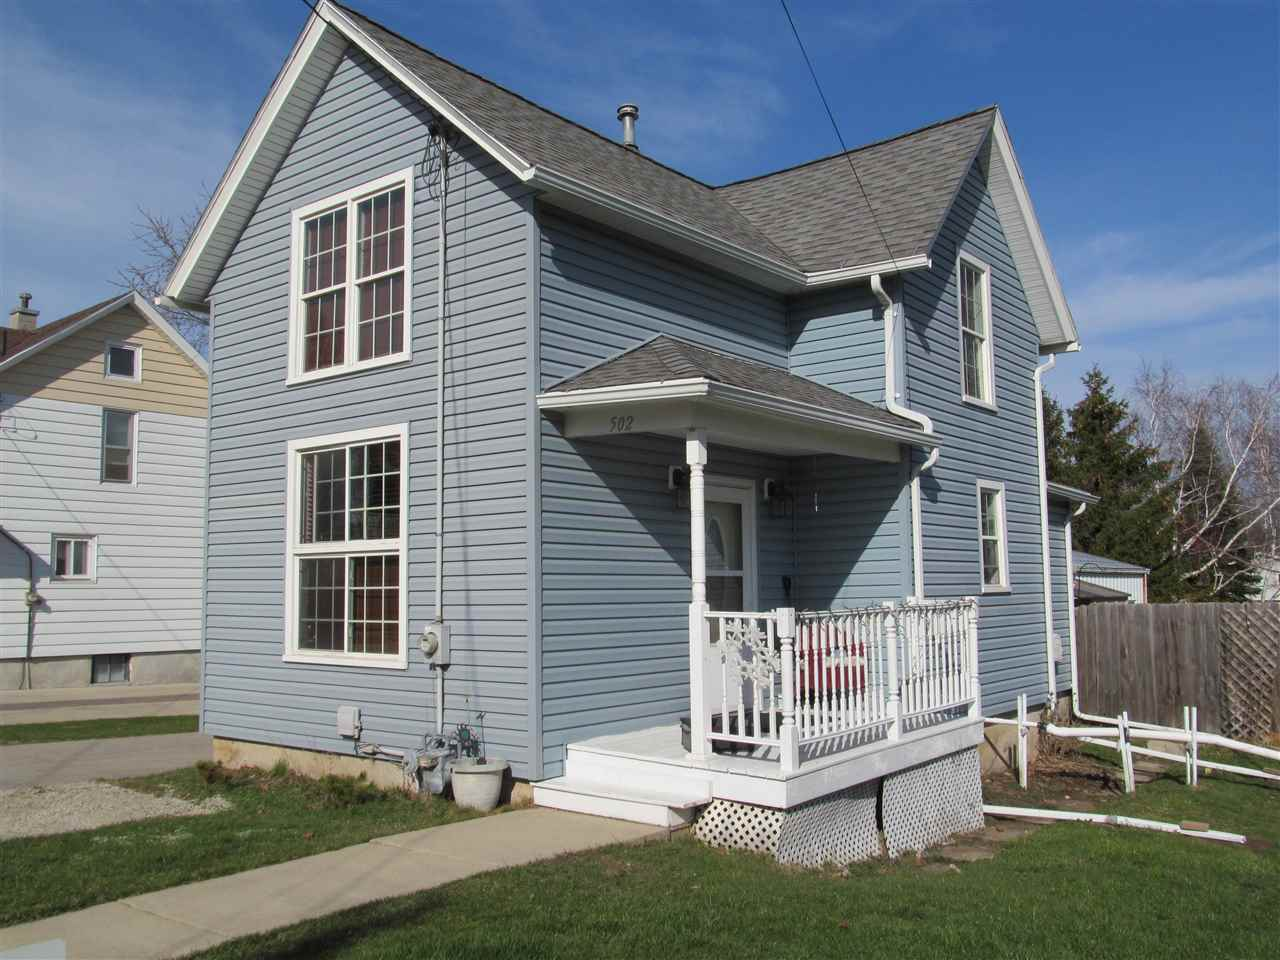 502 Grove St, Mayville, WI 53050